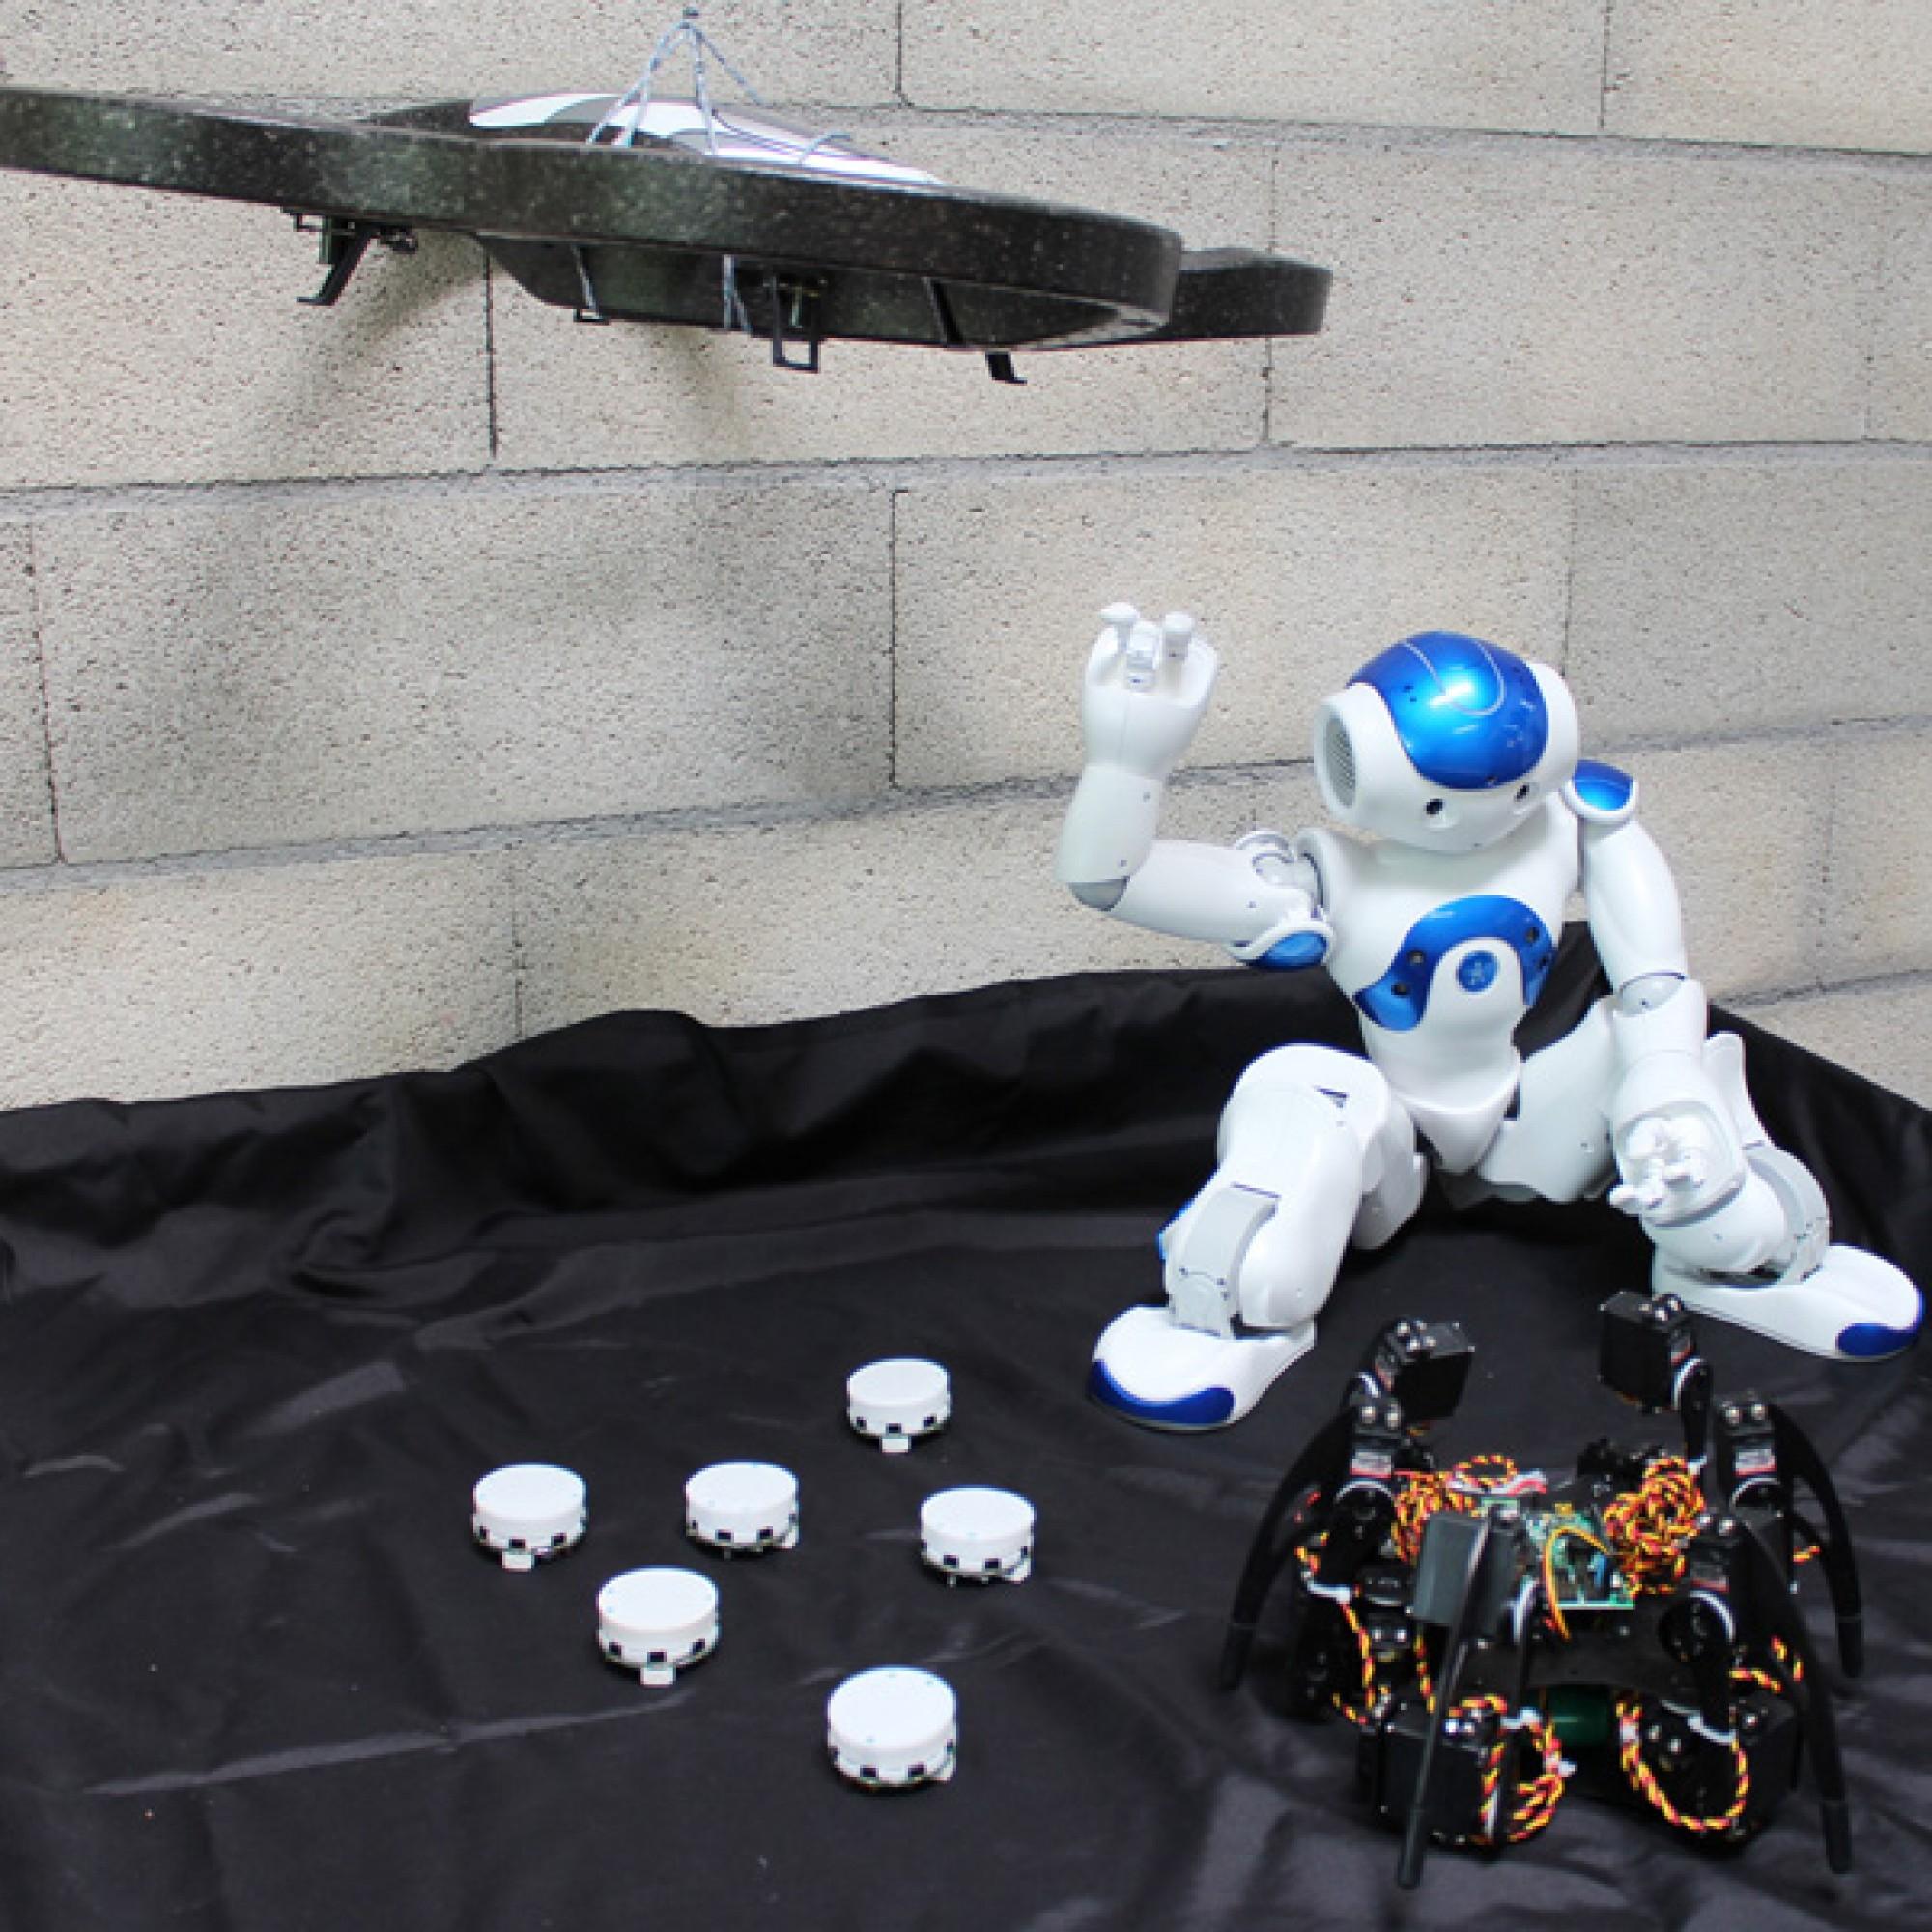 Roboter der HEIG-VD (Andres Perez-Uribe)